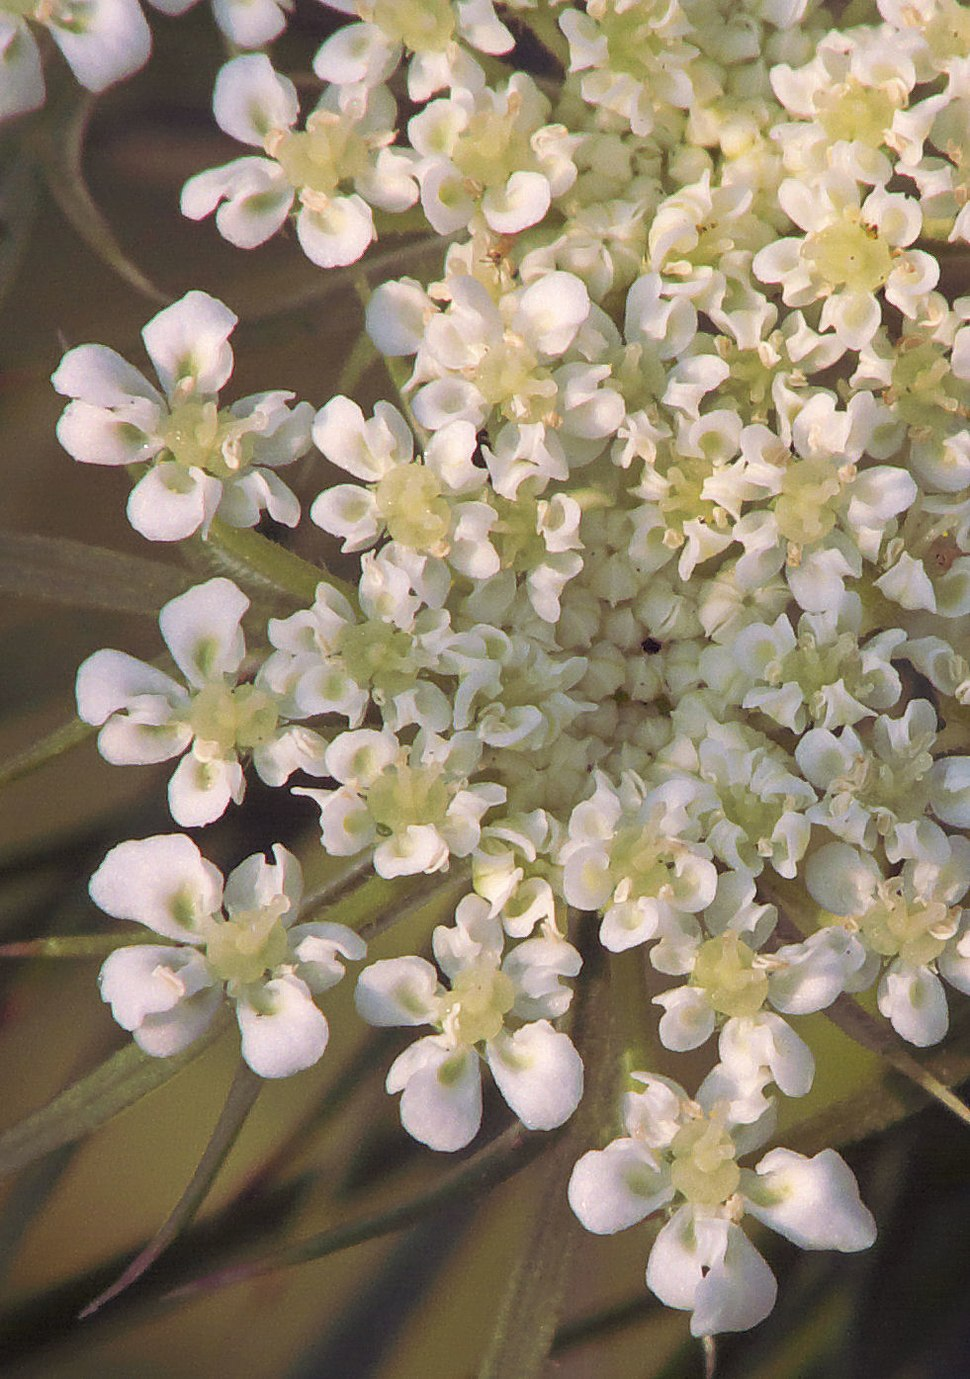 Daucus carota flowers, peen %27Napoli%27 (1)